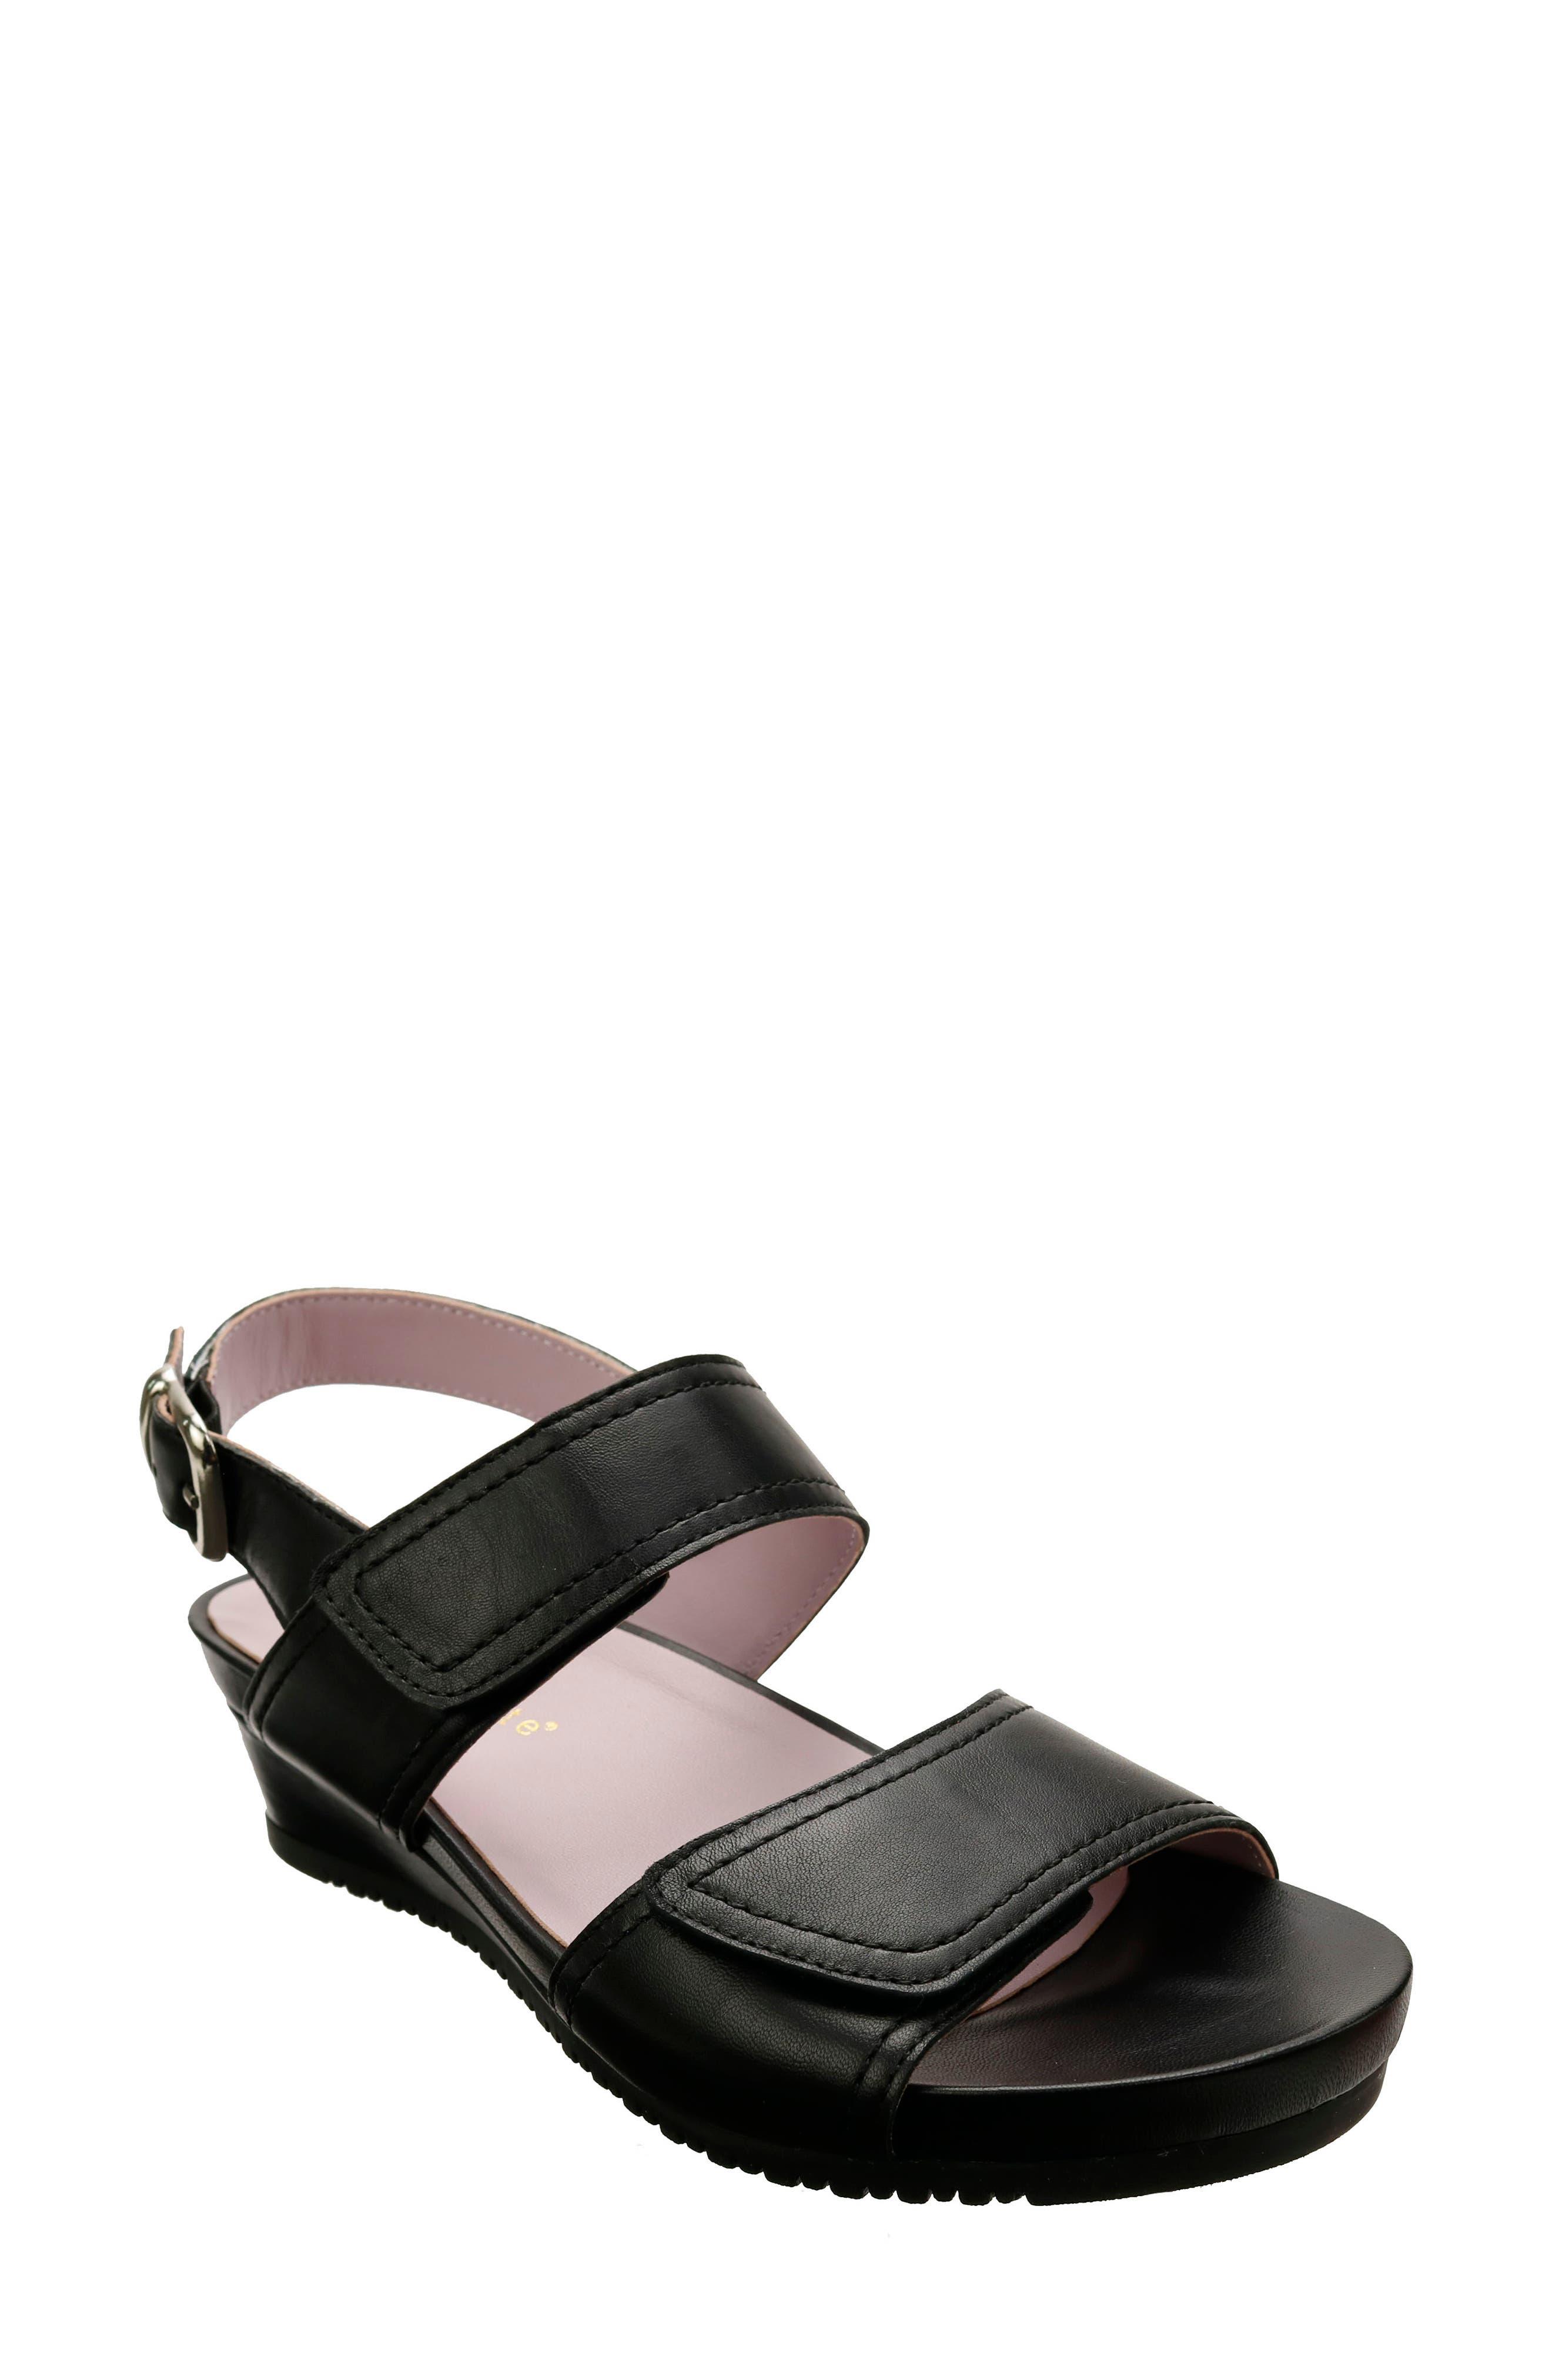 Duo Wedge Slingback Sandal